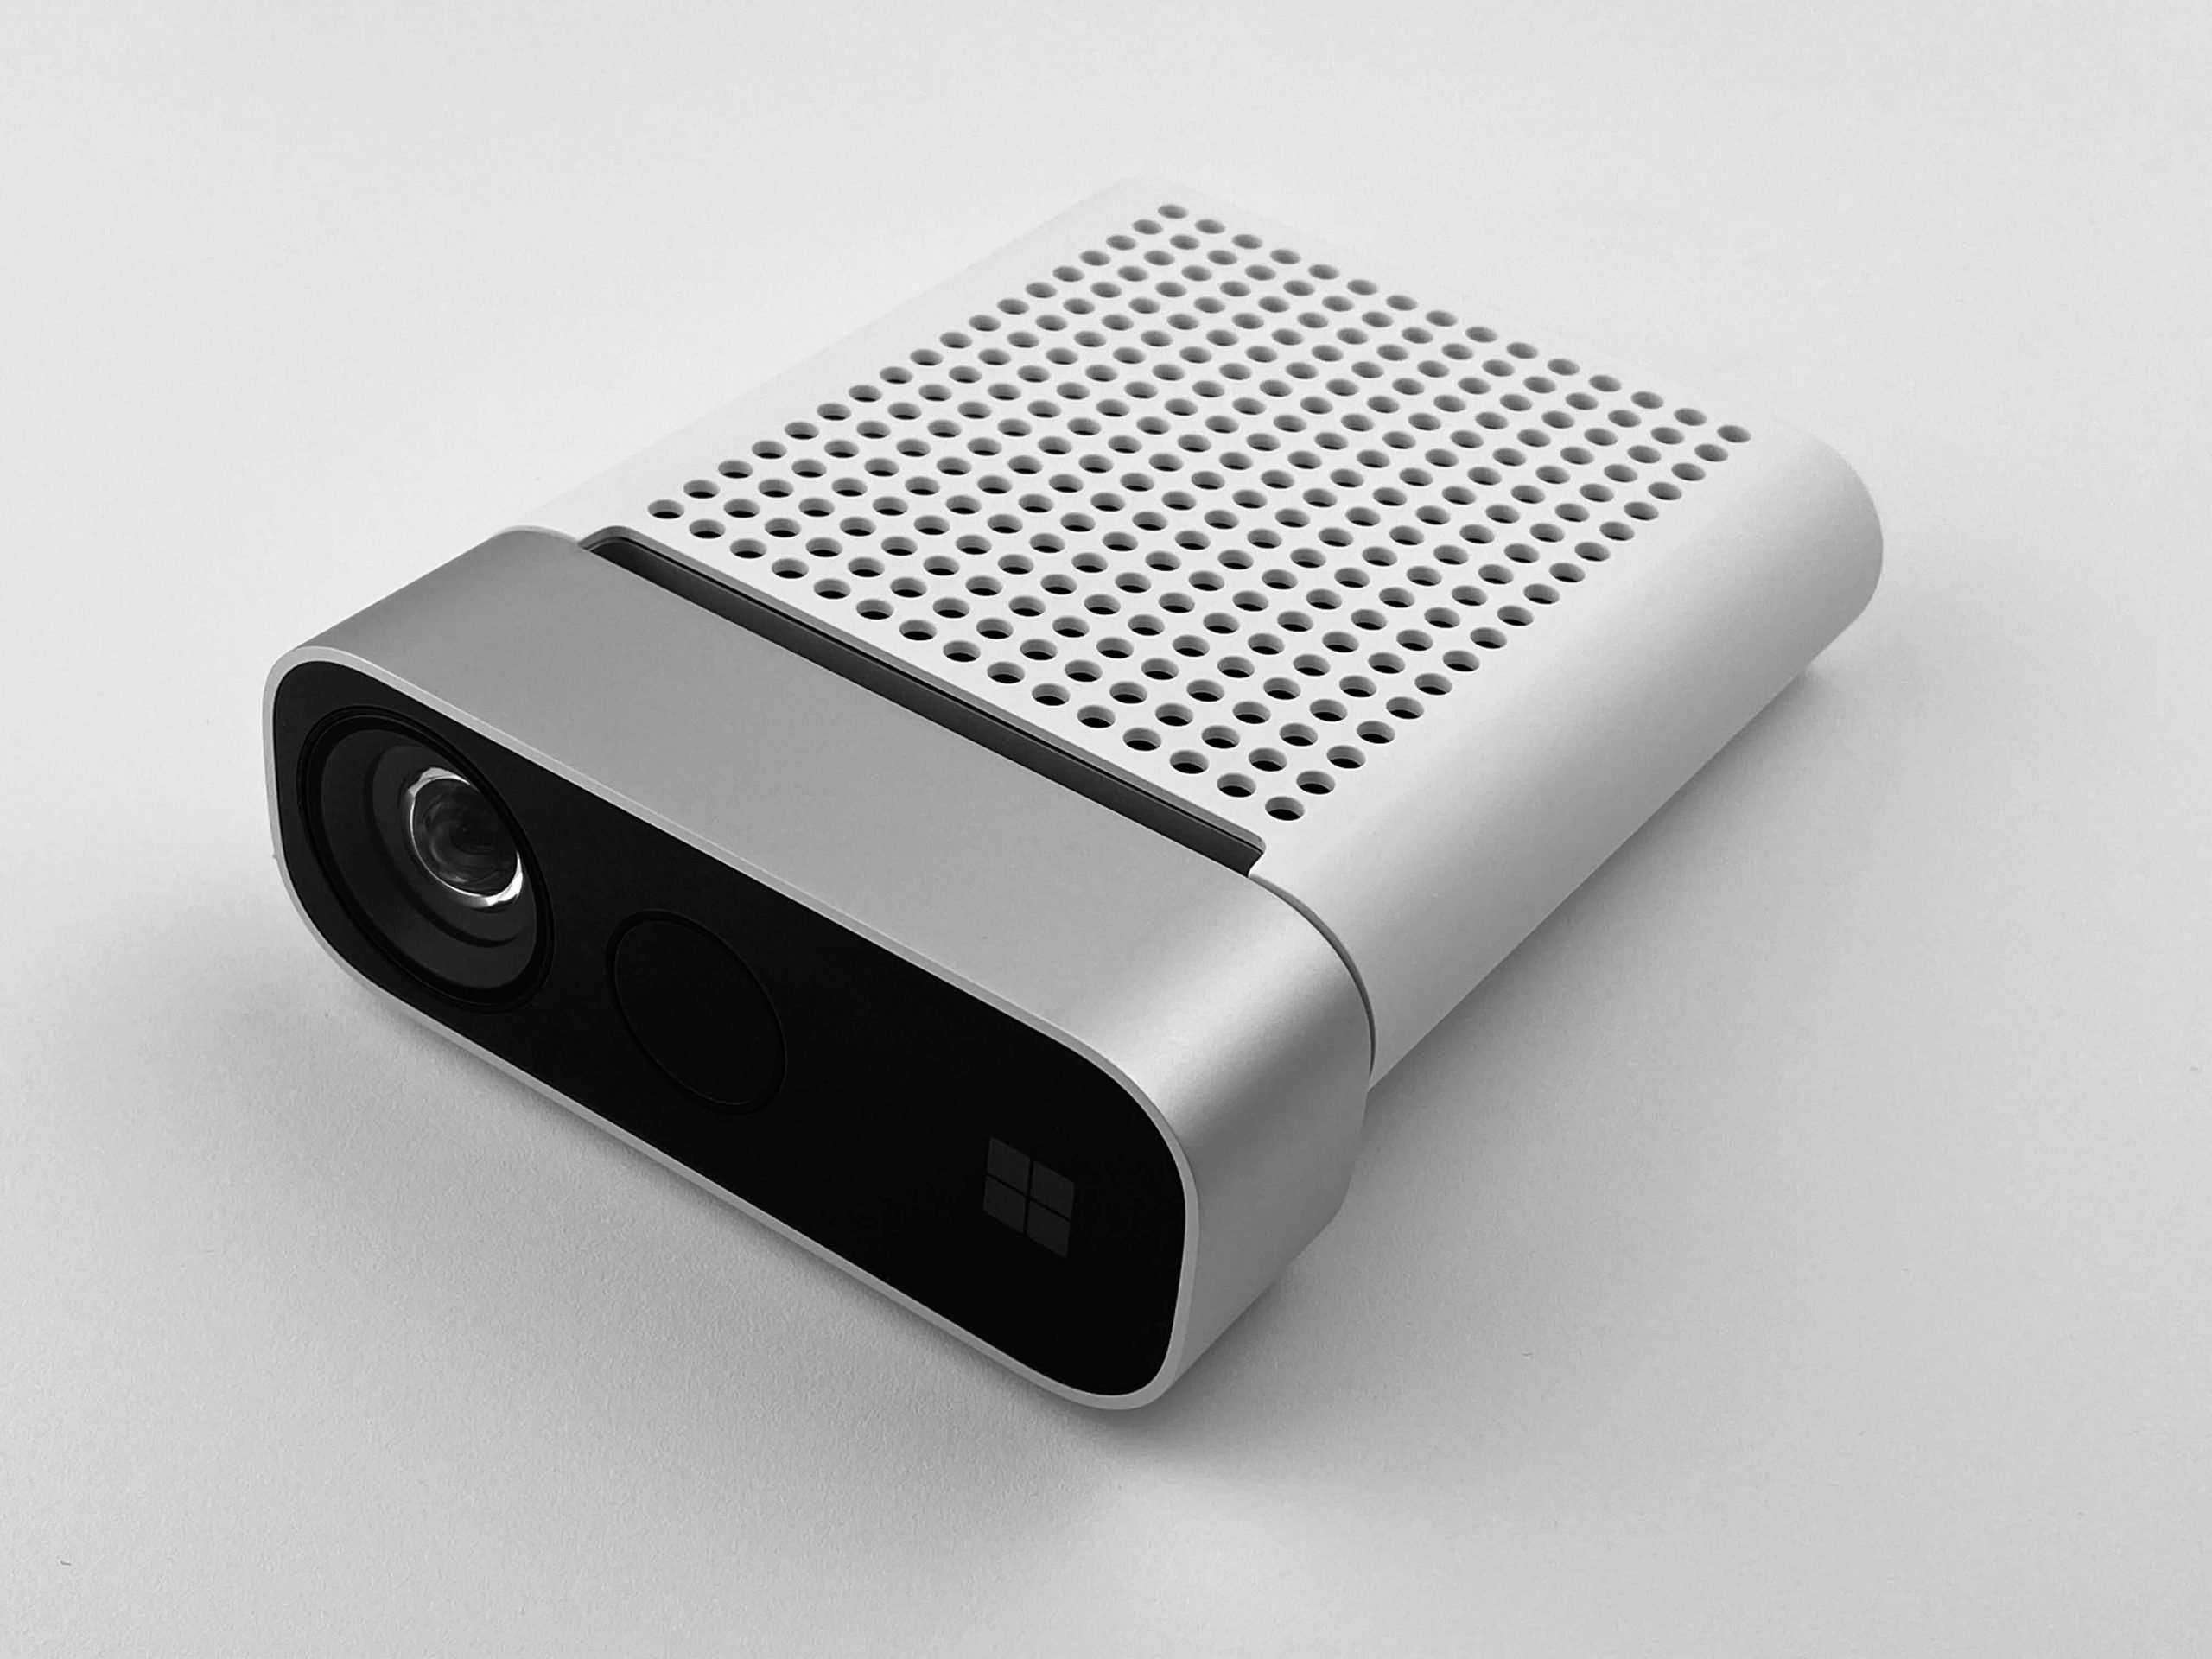 Azure Kinect Masterclass: Sensor Anatomy